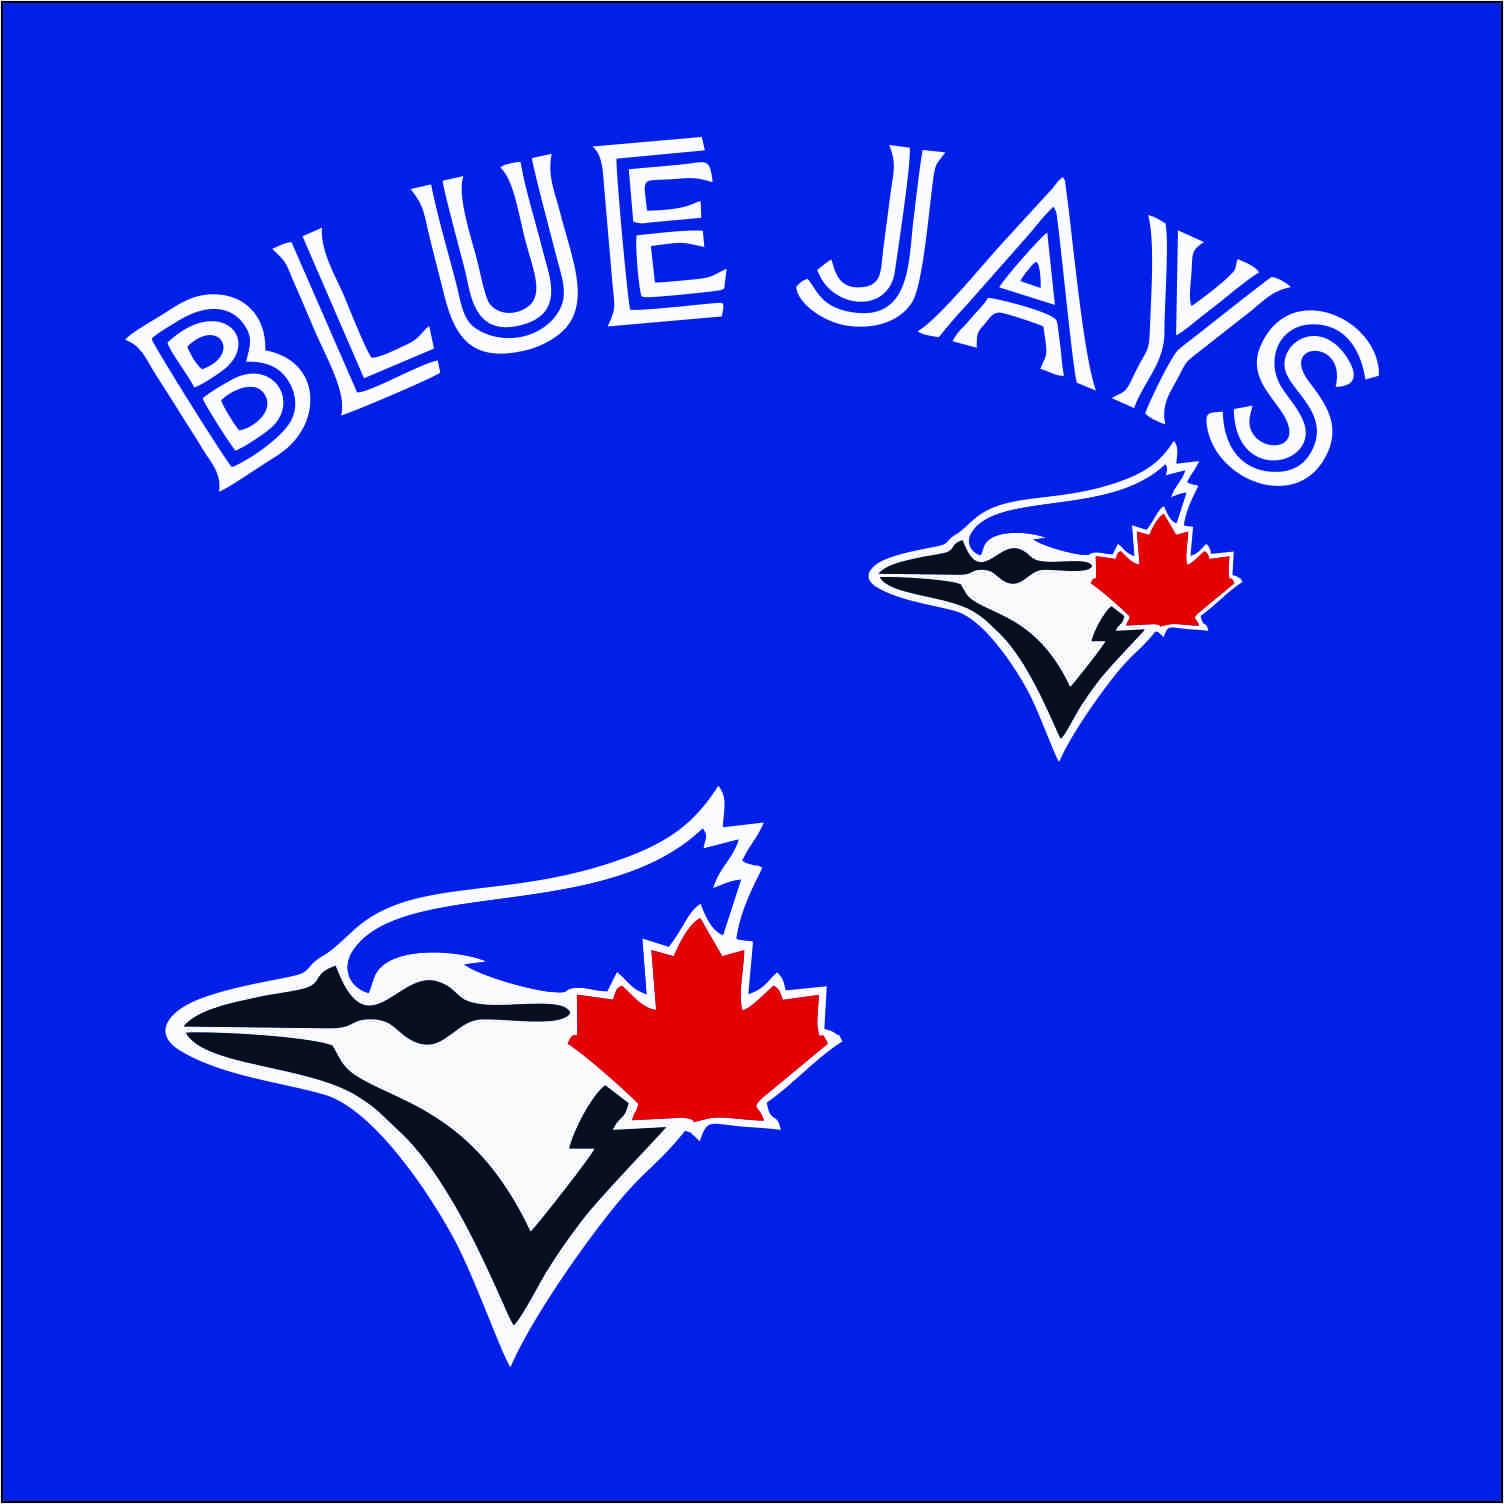 Blue Jays.jpg